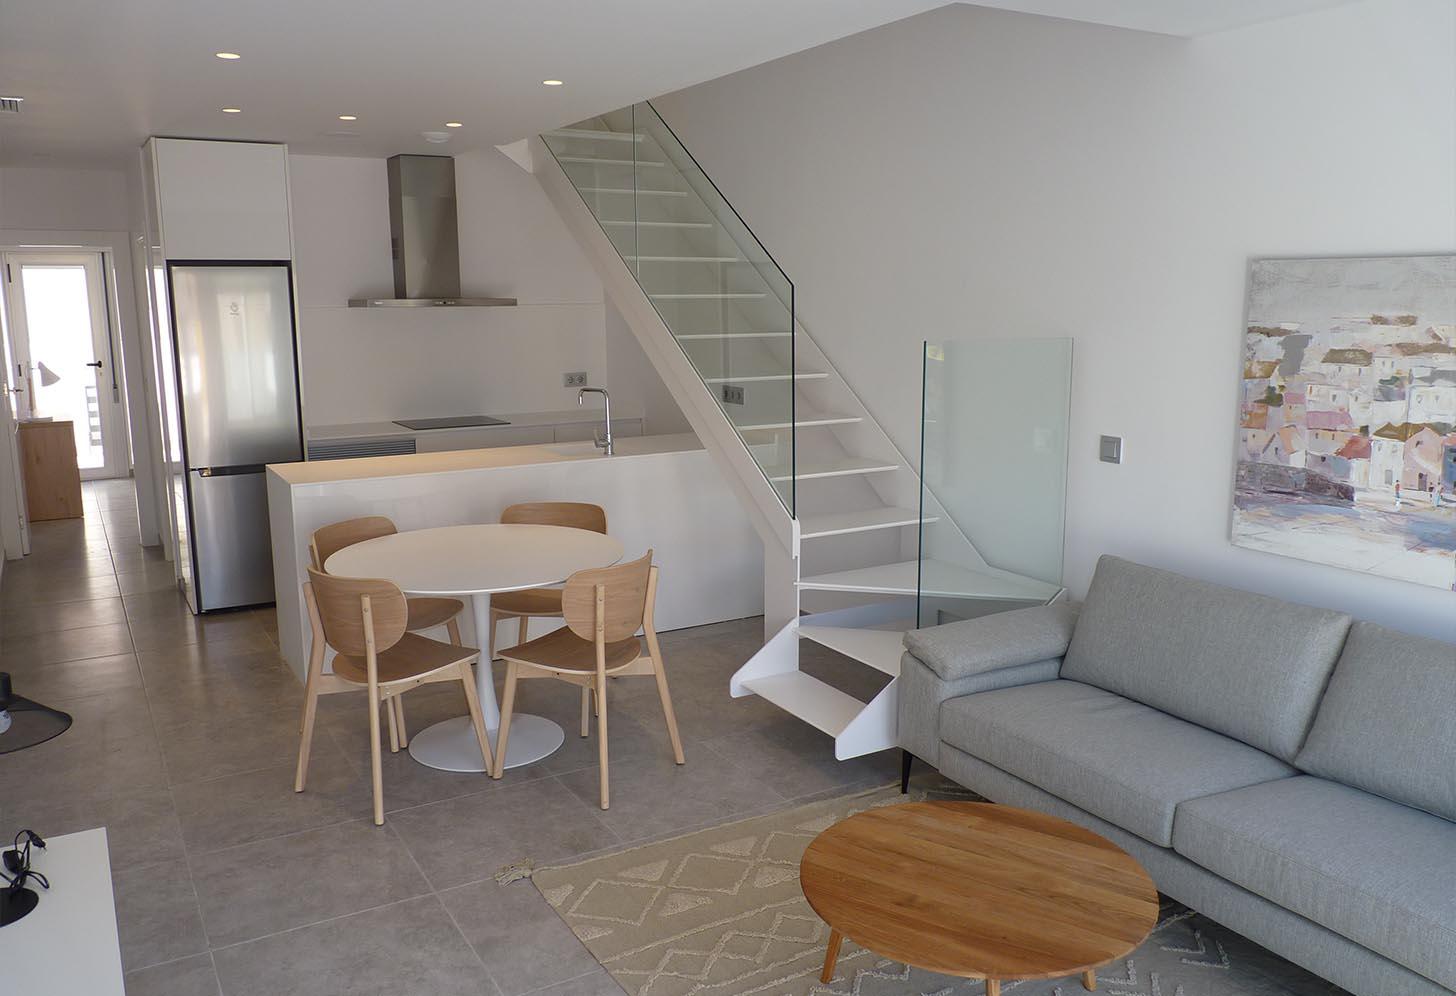 immobilier neuf espagne costa blanca on-n5 pinada margove salon